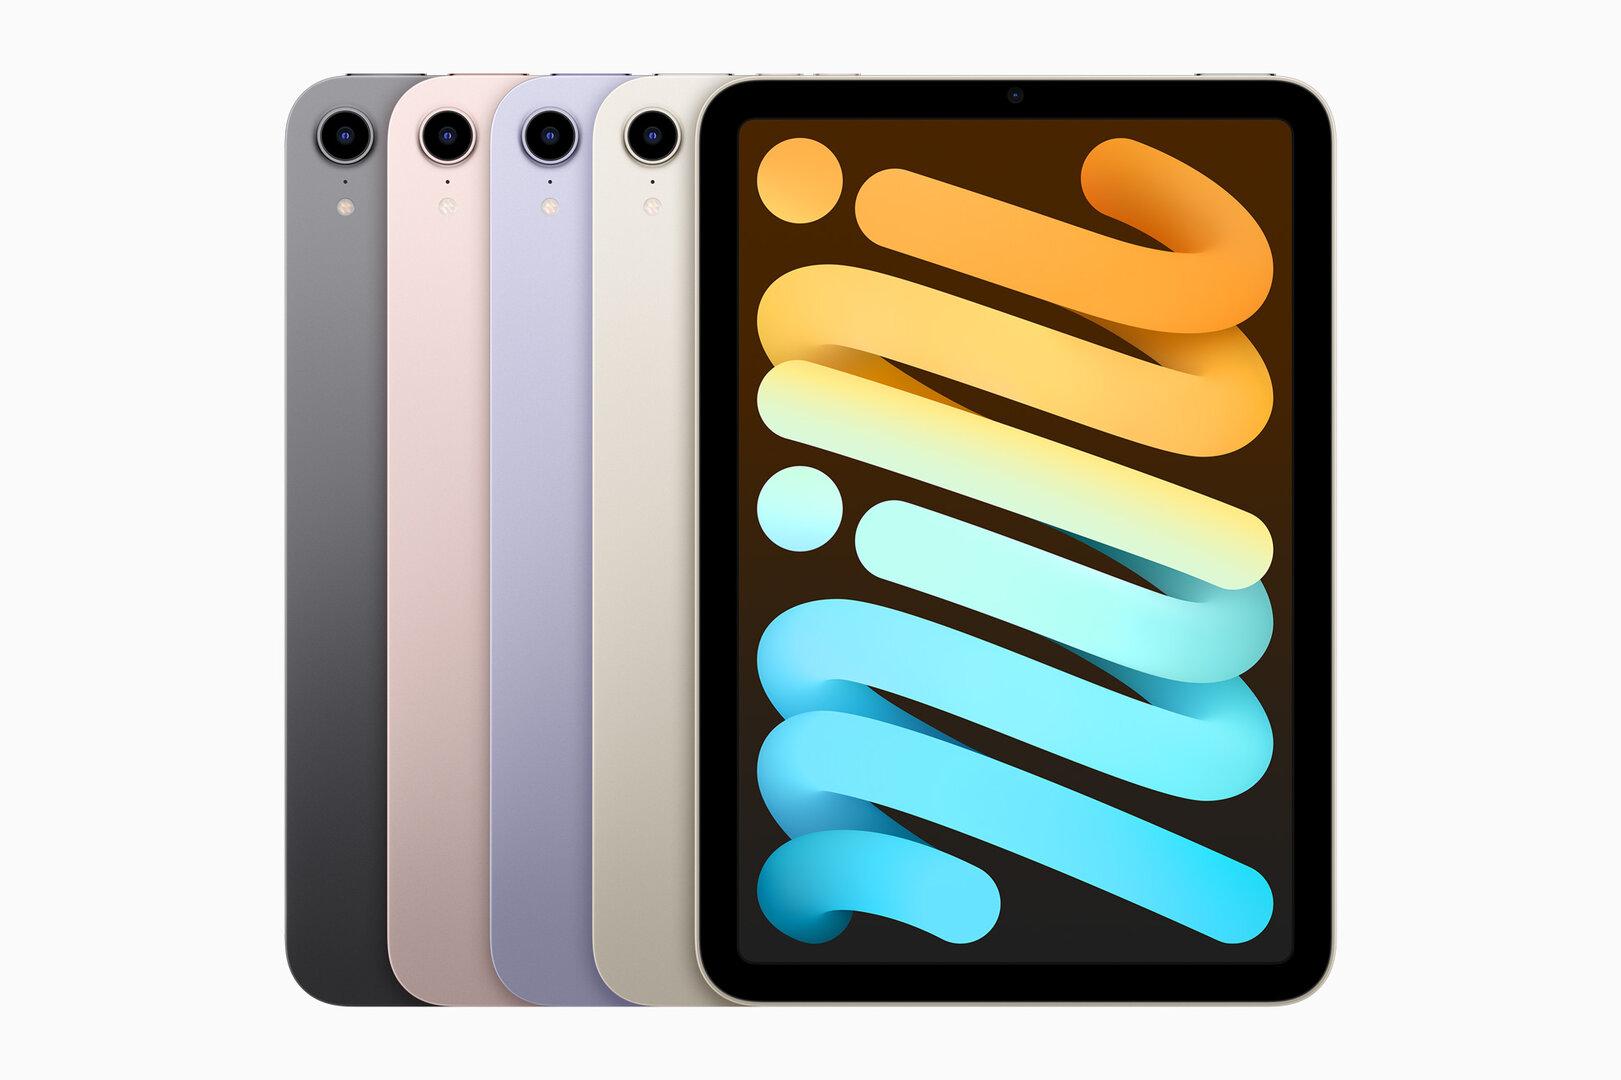 Das neue iPad mini (2021) der 6. Generation